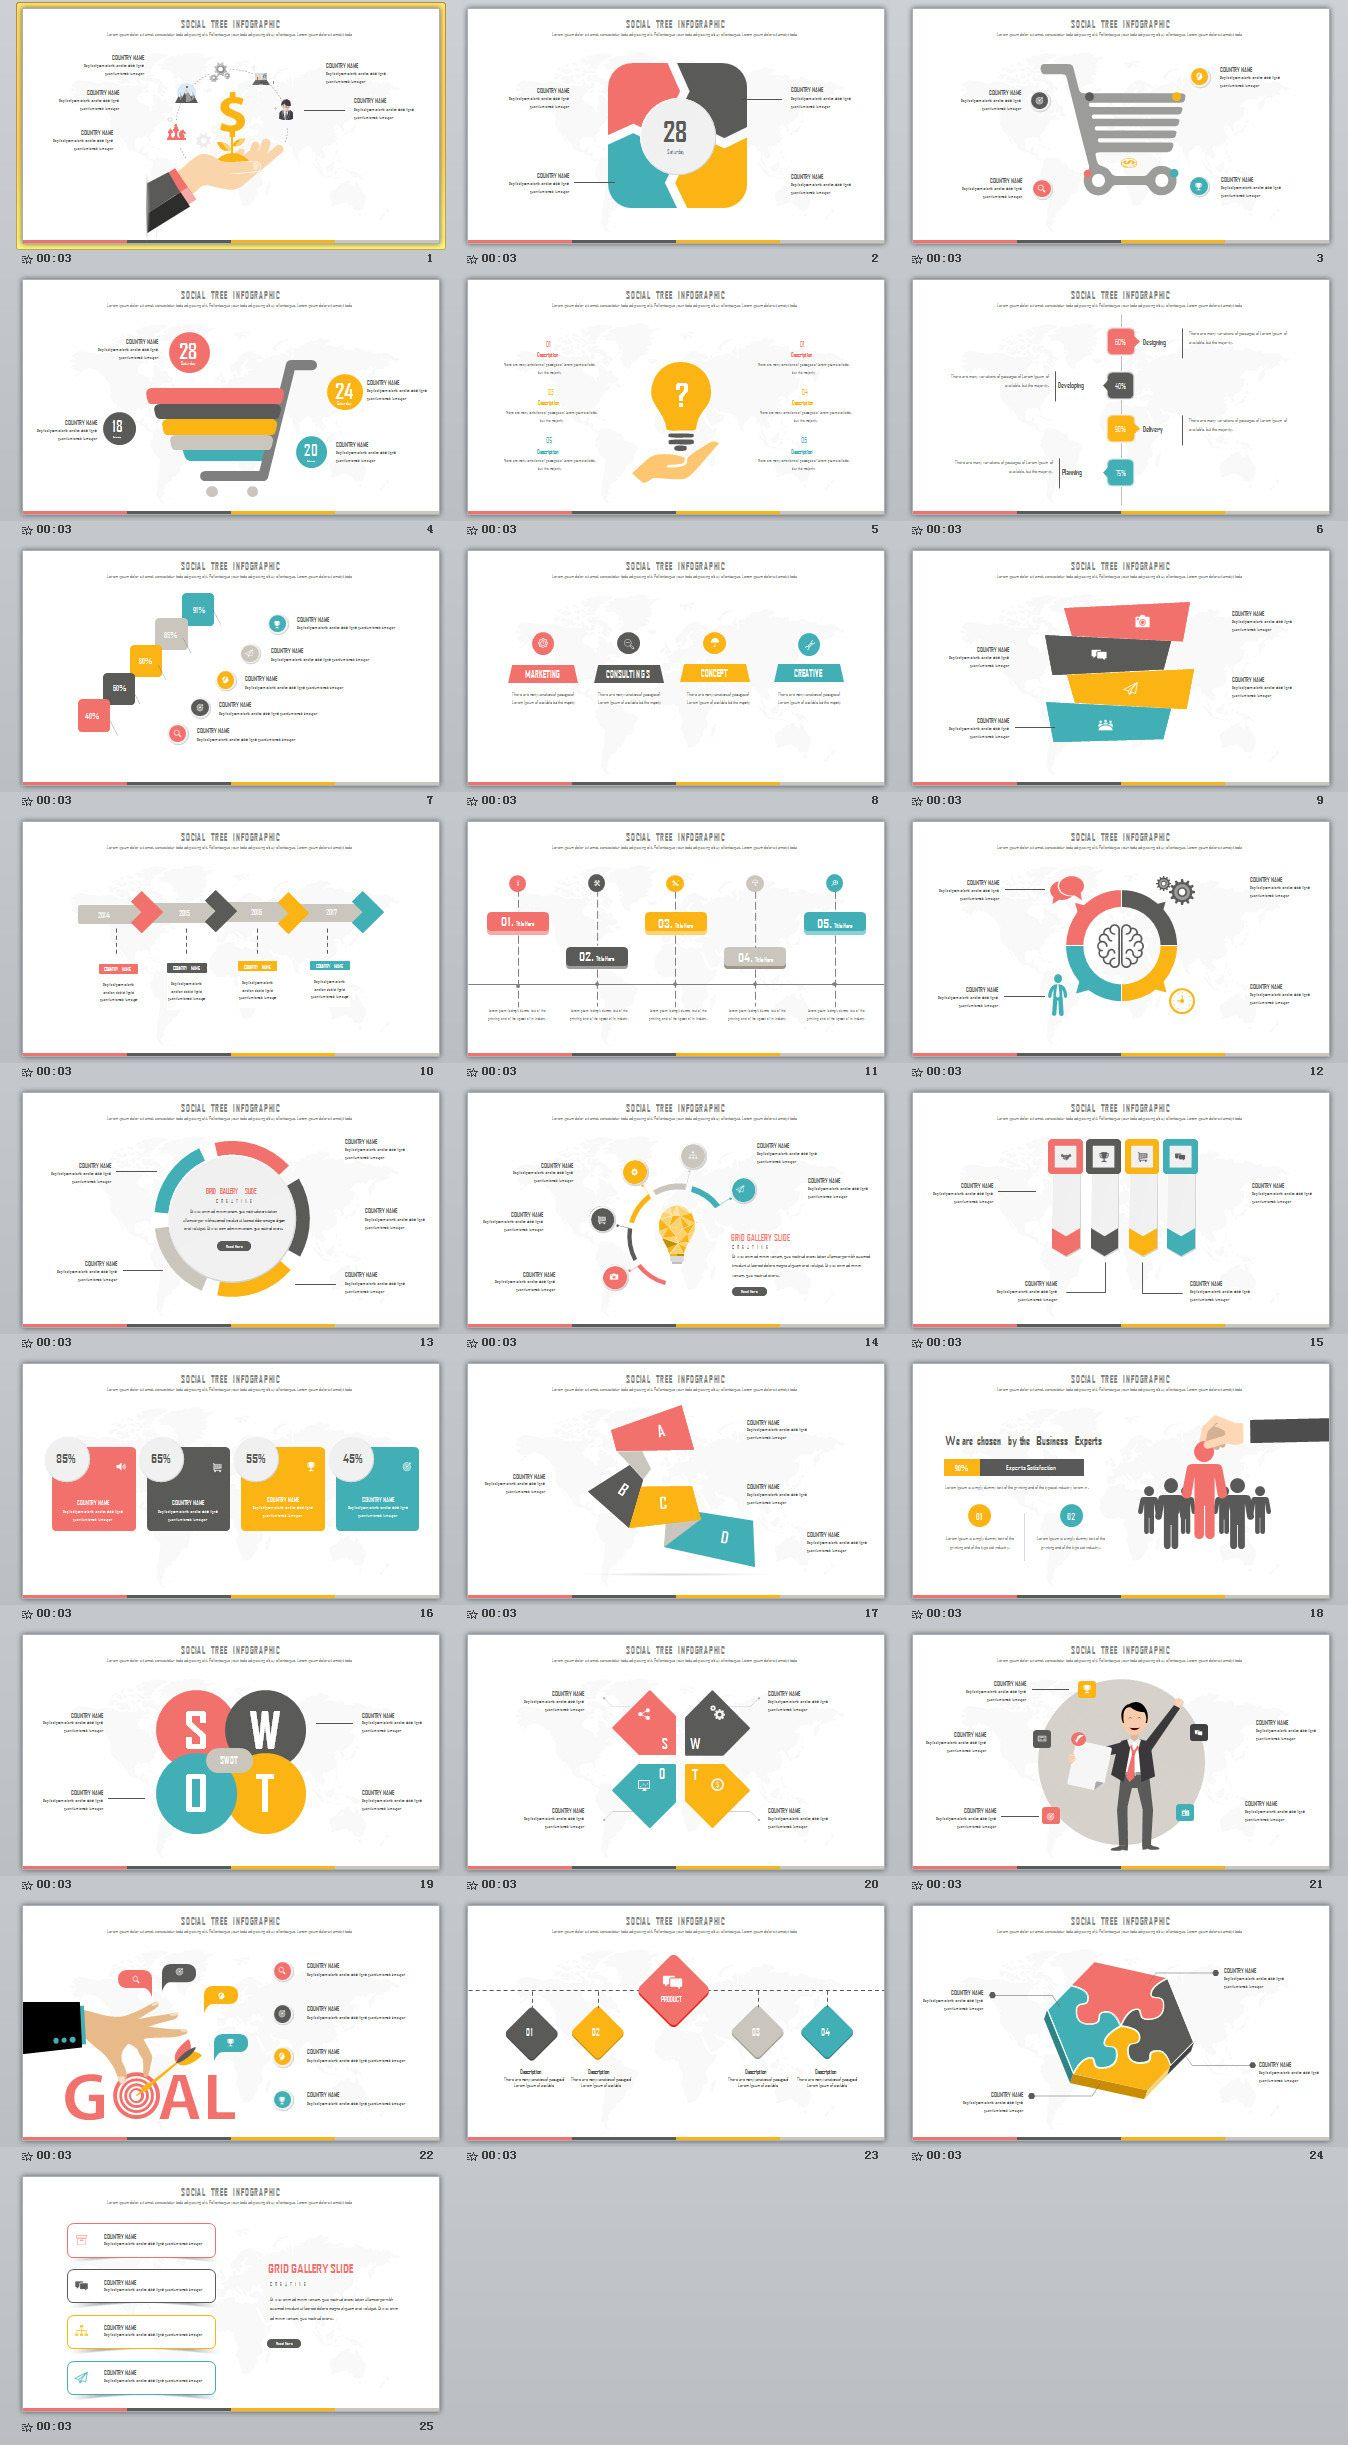 25 timeline infographics powerpoint template on behance powerpoint 25 timeline infographics powerpoint template on behance powerpoint templates presentation animation toneelgroepblik Gallery